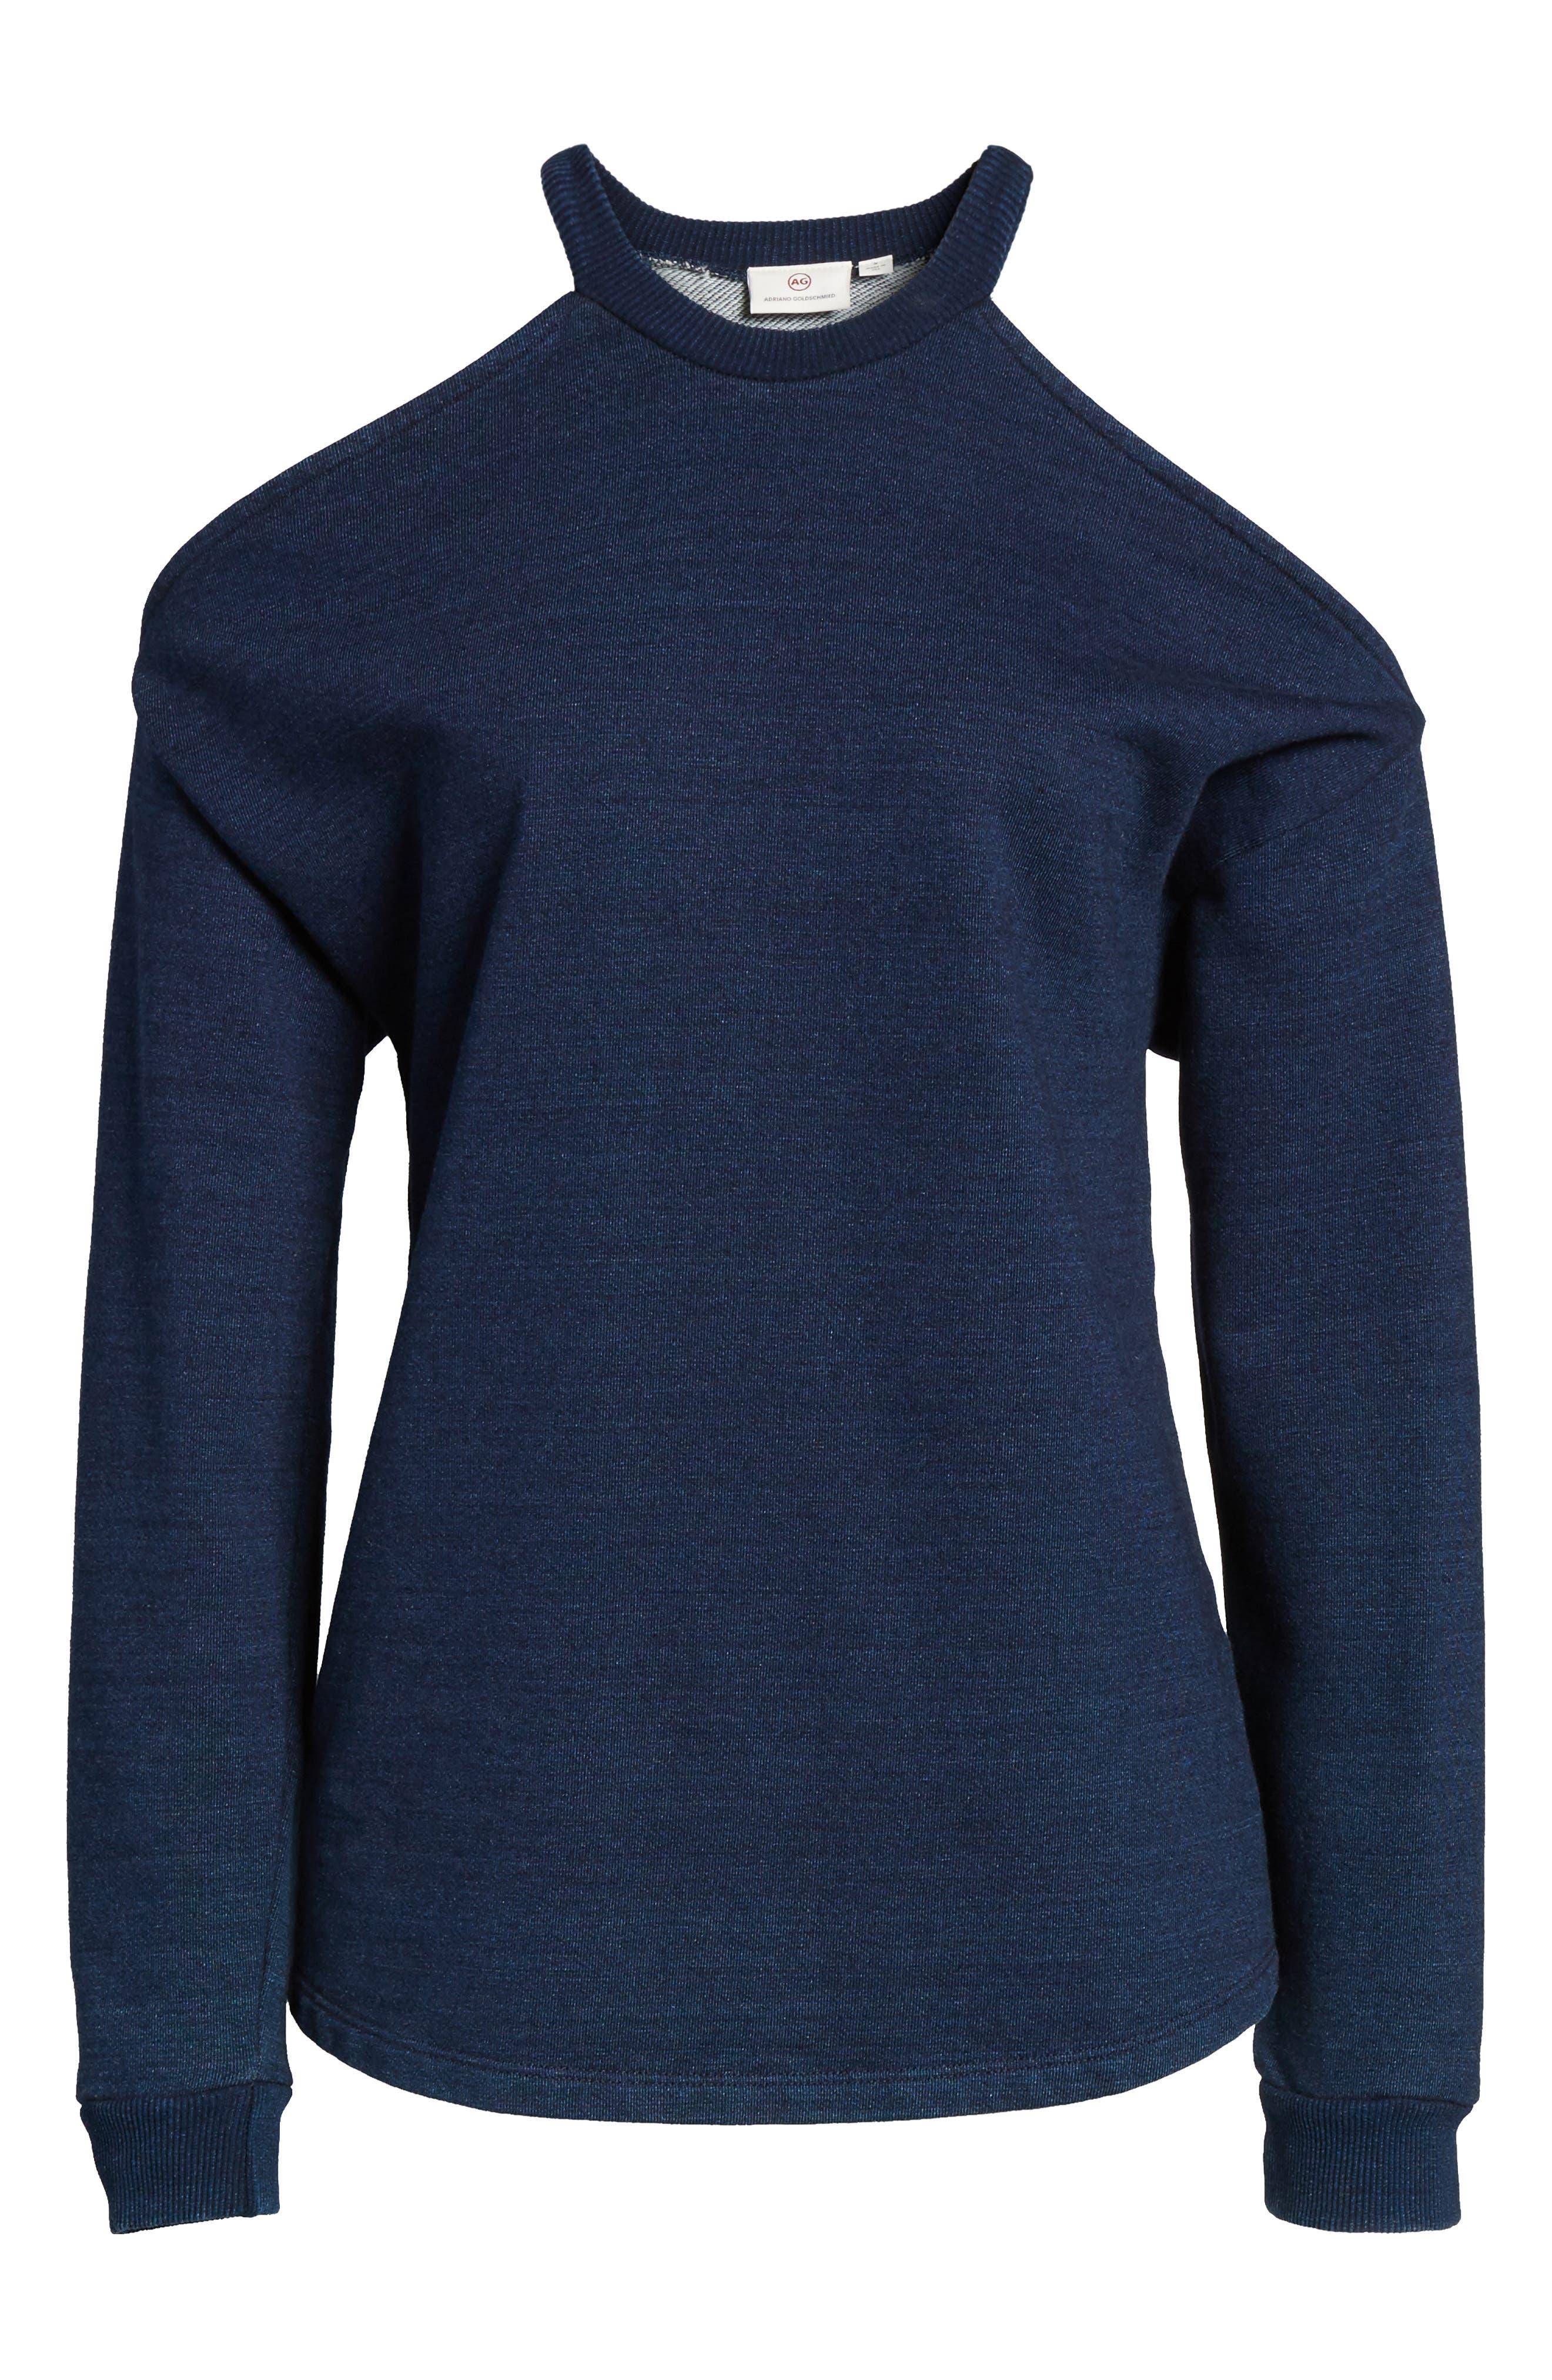 Gizi Cold Shoulder Sweatshirt,                             Alternate thumbnail 7, color,